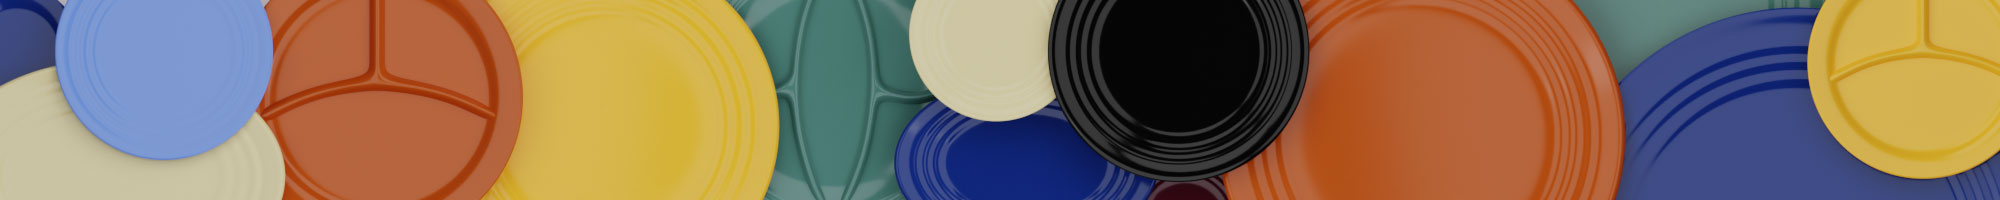 QwkDog 3D Bauer Pottery Plates Banner